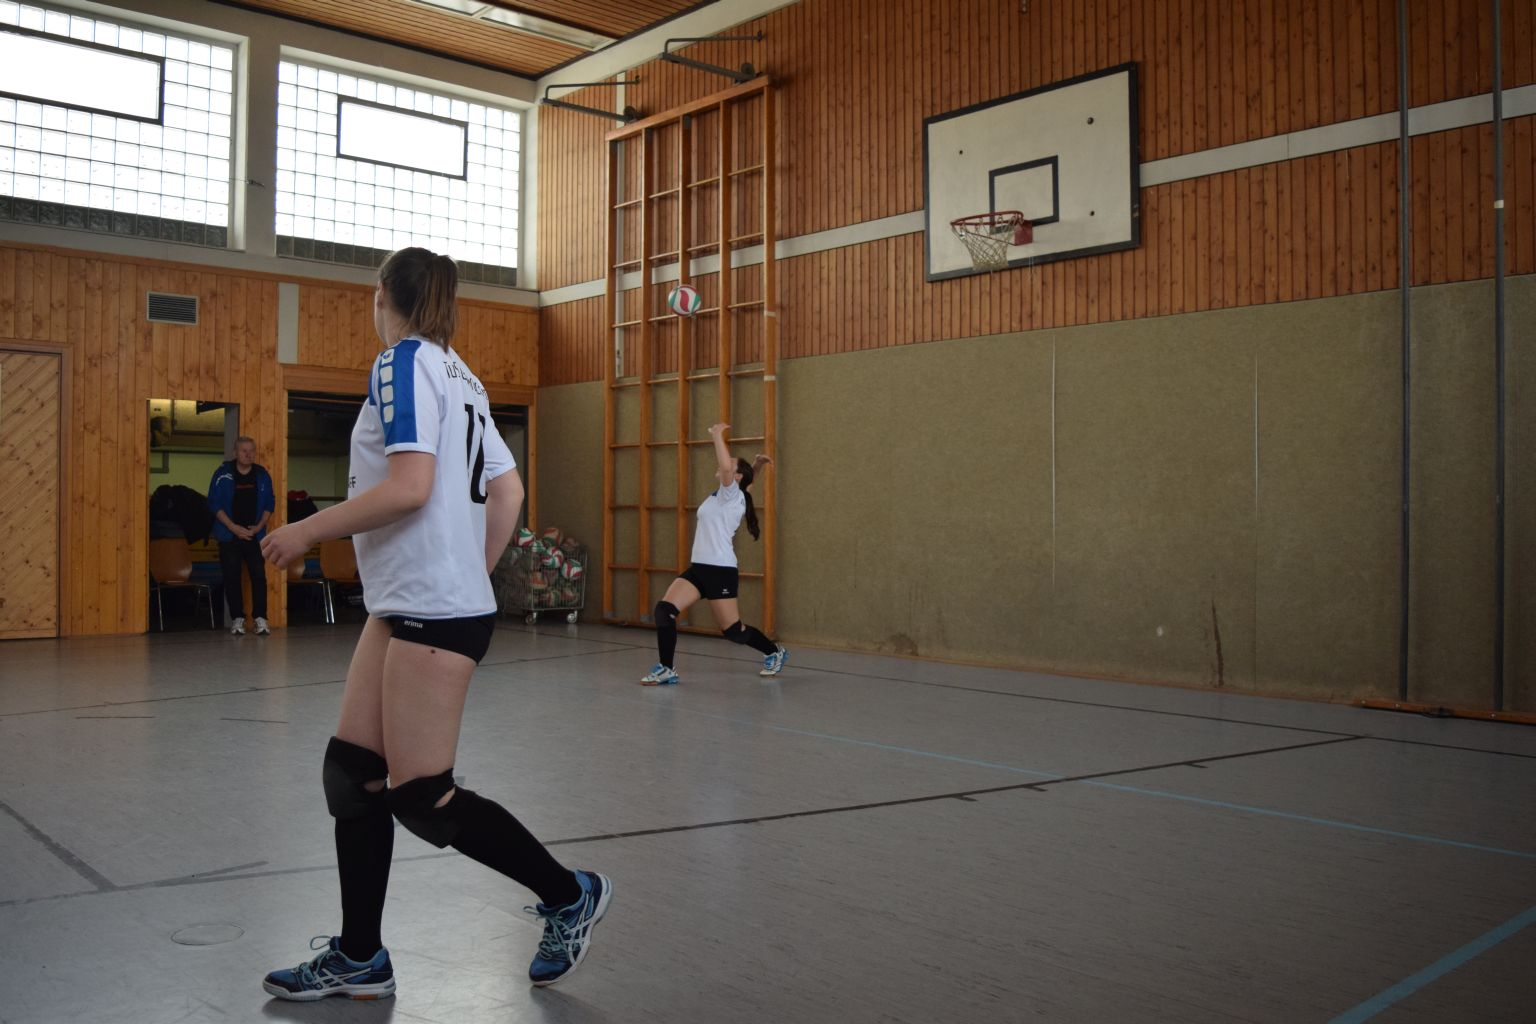 170311_Volleyball_DSC_0013